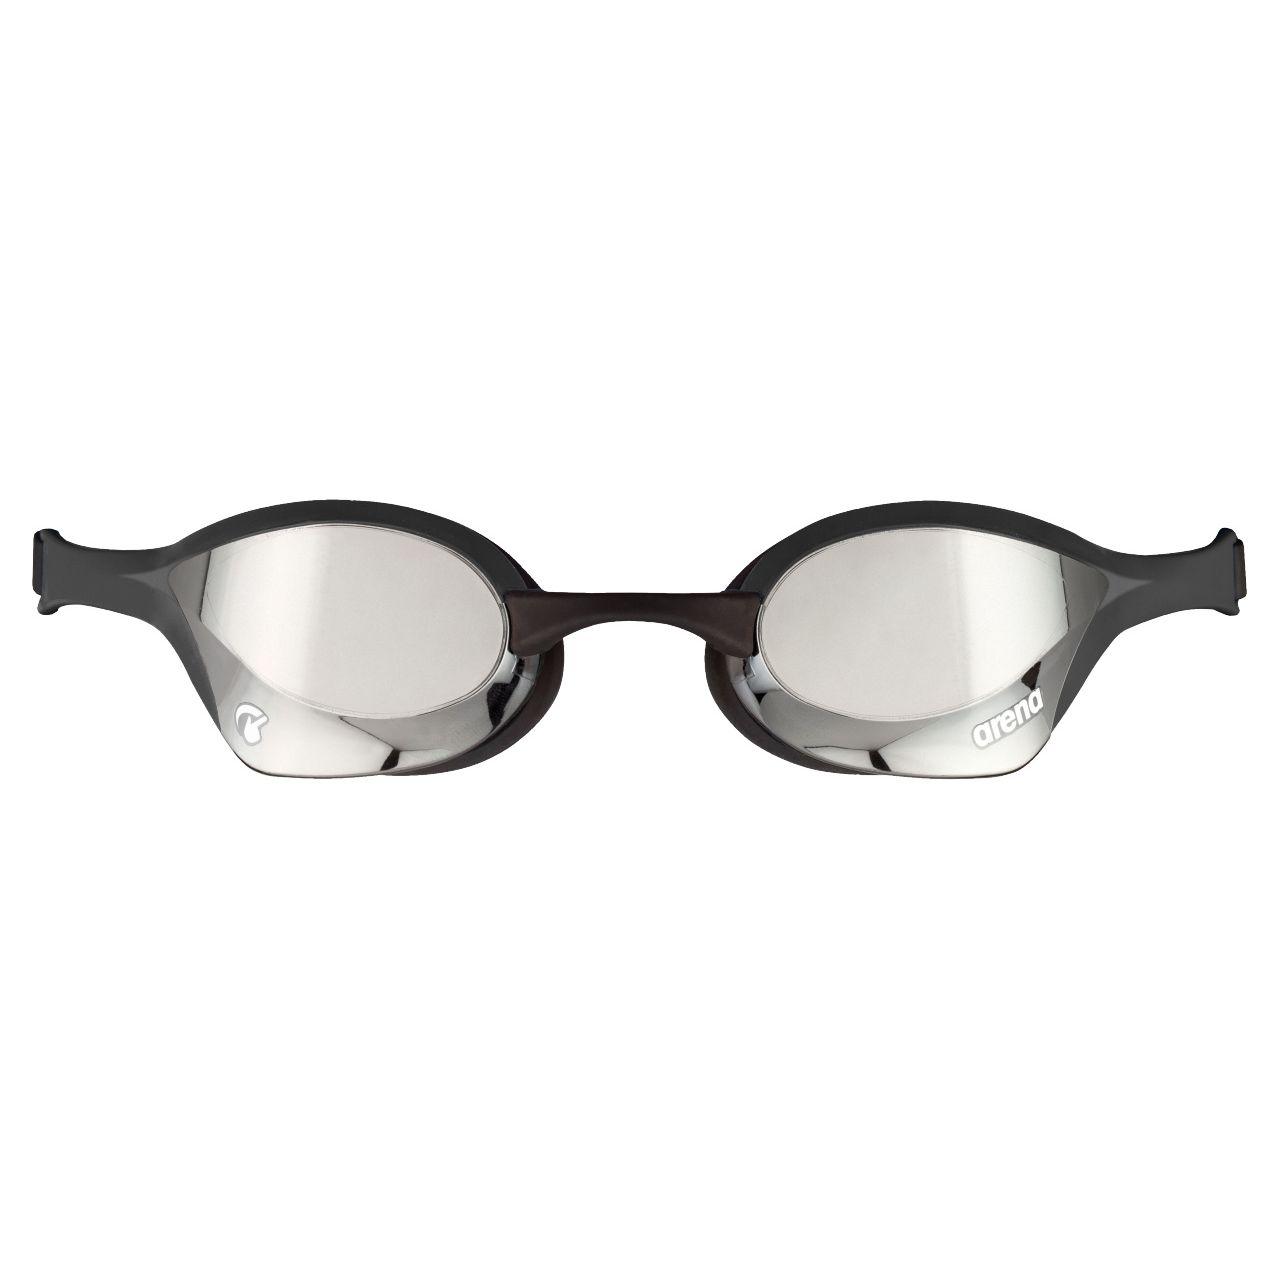 Goggles de Natación para Competición arena Unisex Cobra Ultra Swipe Mirror_6240